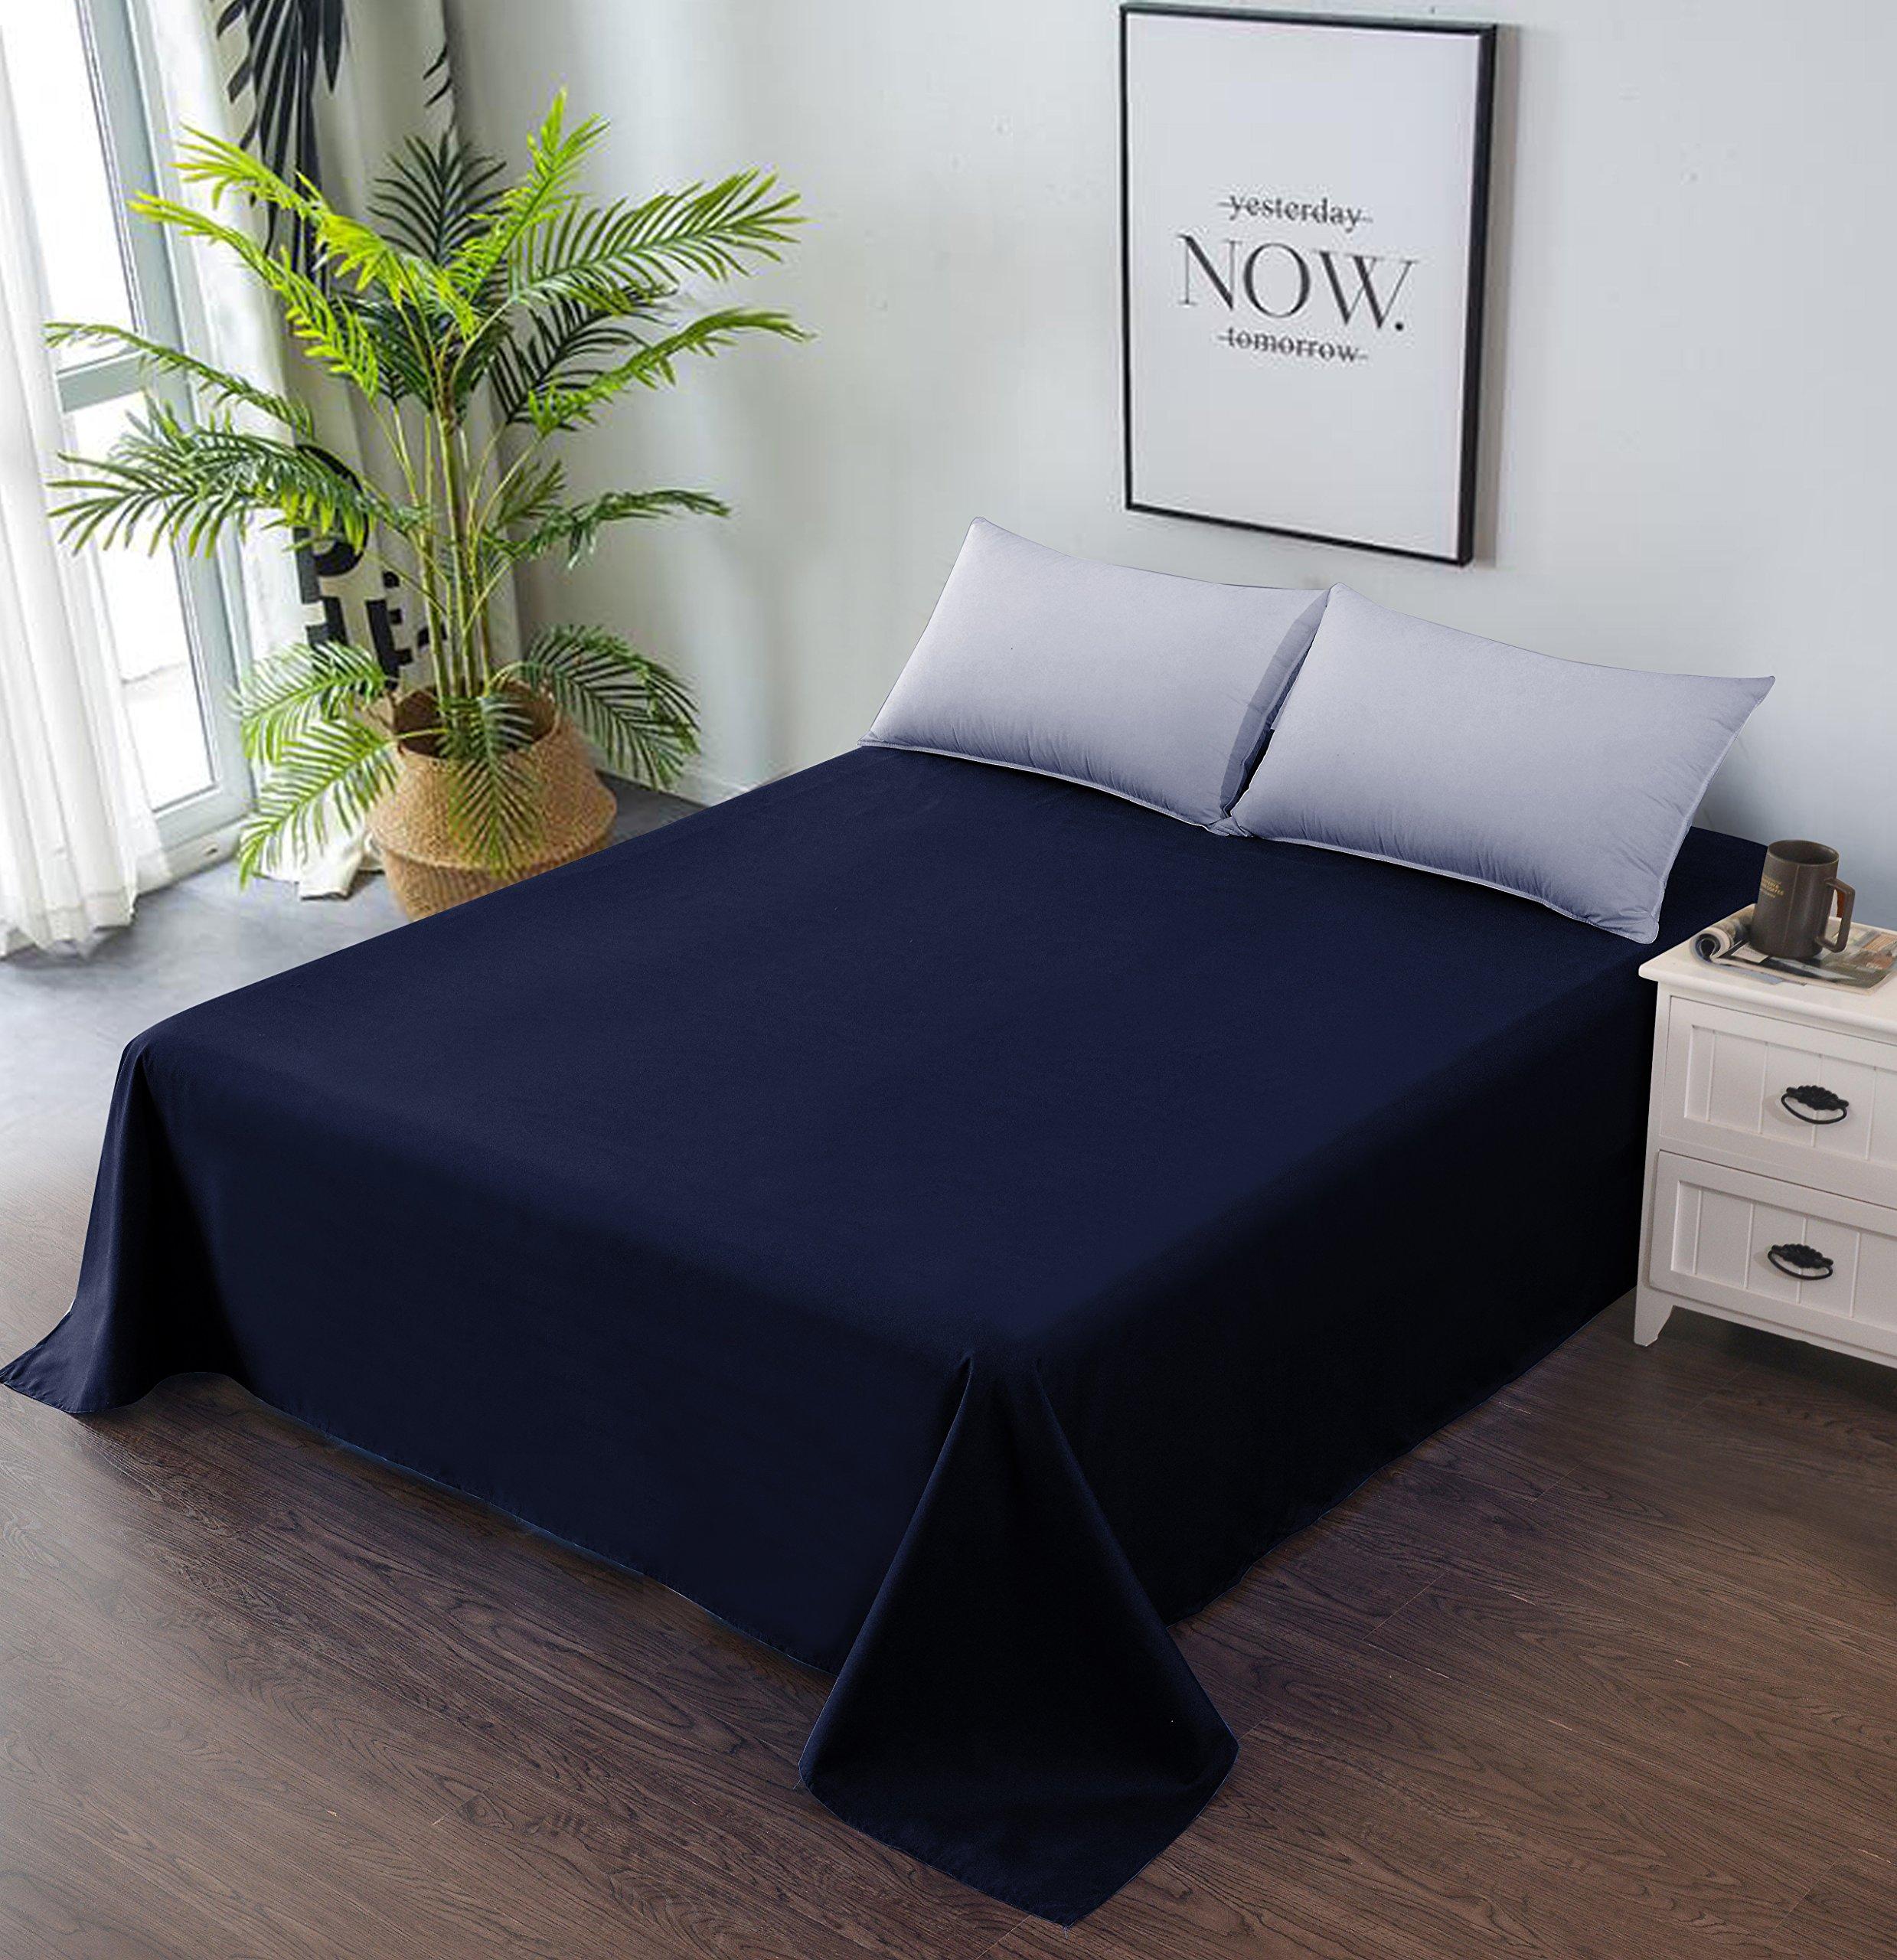 Goza Bedding Microfiber Flat Sheet (Navy, Queen)